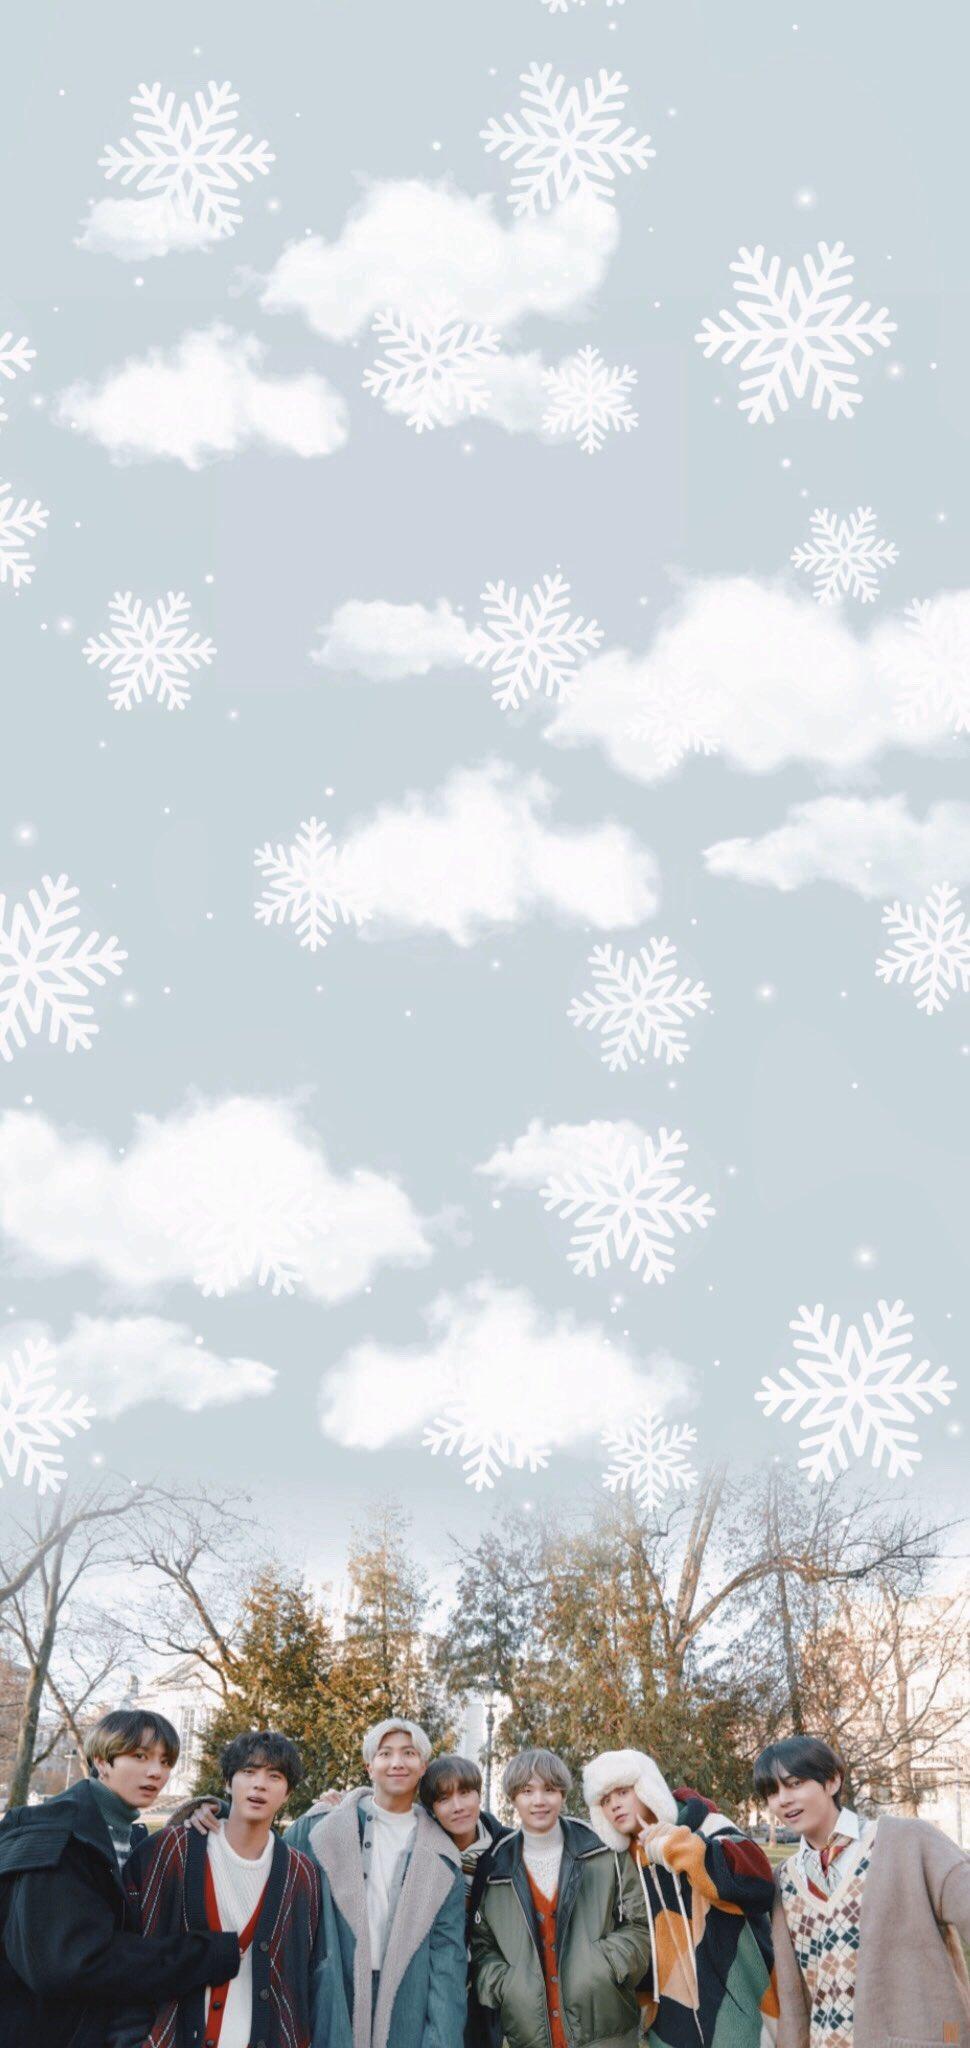 Lockscreen Bts On Twitter Bts 2020 Winter Package Lockscreens 1 Rt If Saved If Liked Screenshot If Used By Ò½lla C Bts Twt Https T Co U94lvdn40n